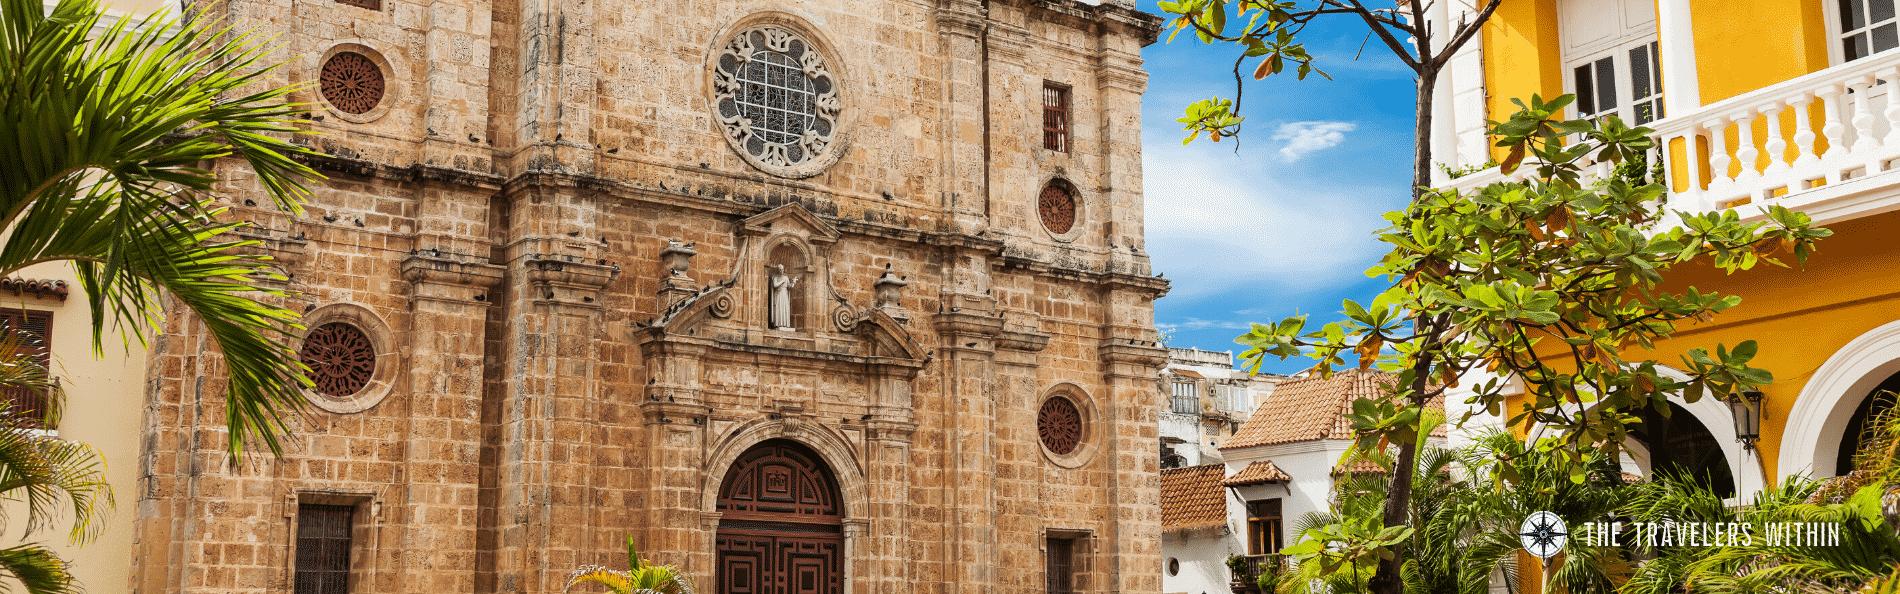 Cartagena Colombia Travel